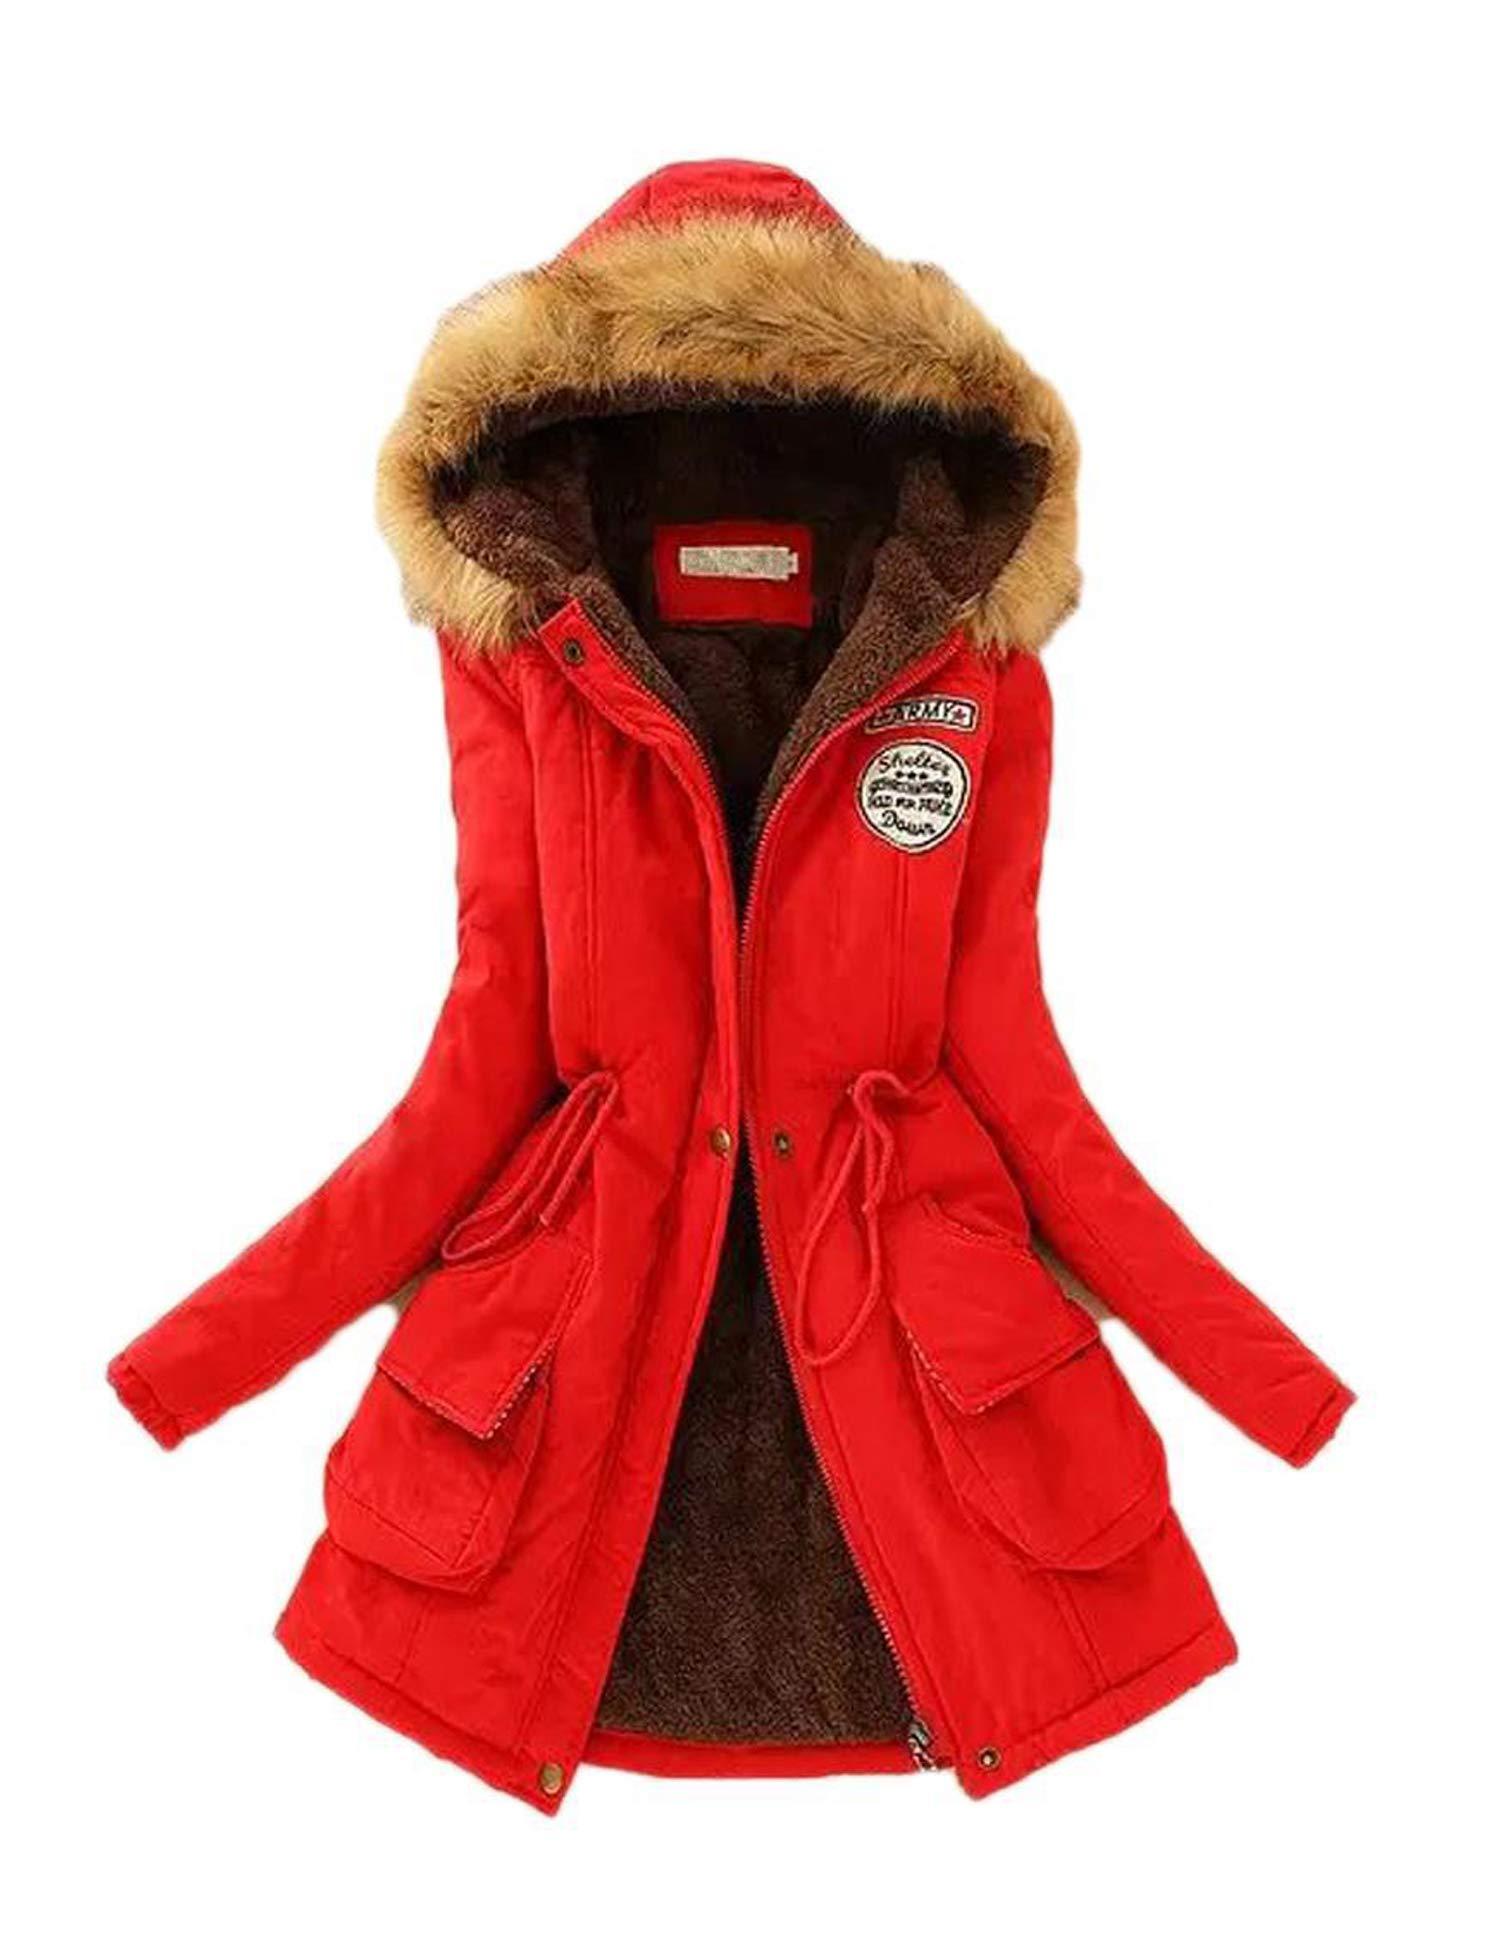 Beyove Women Faux Fur Parka Coat Warm Winter Jacket by Beyove